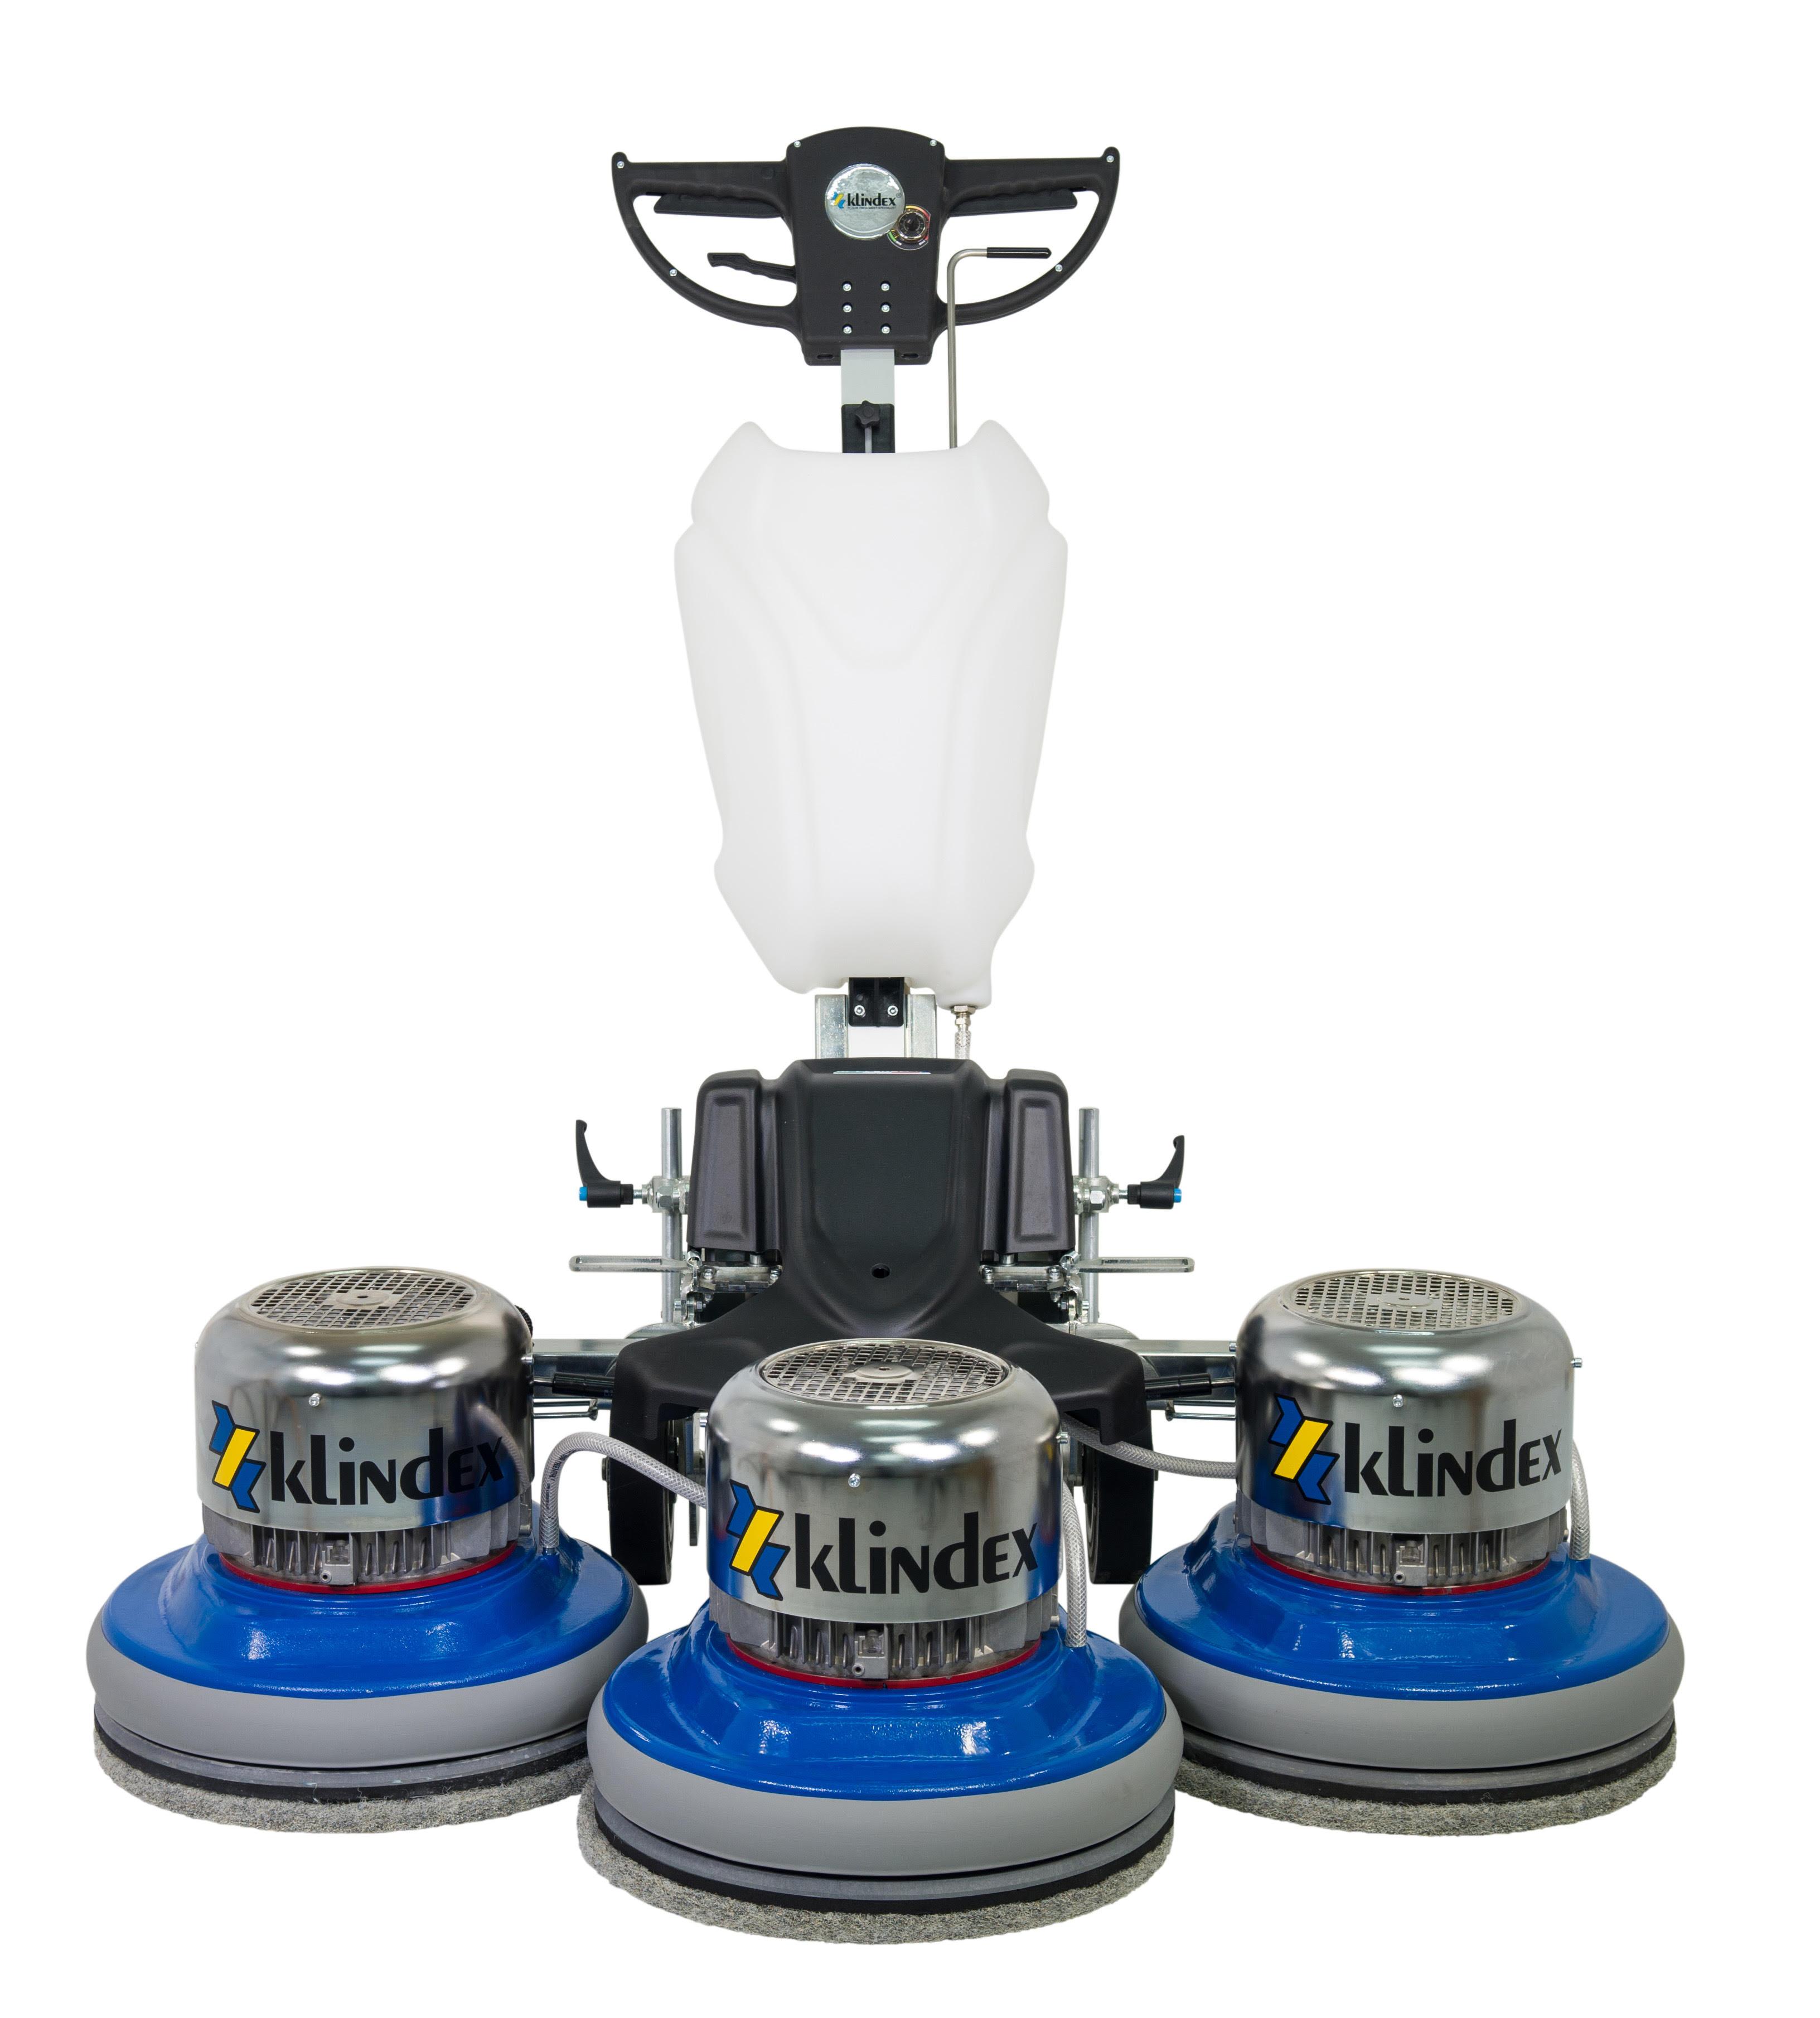 klindex-triple-k